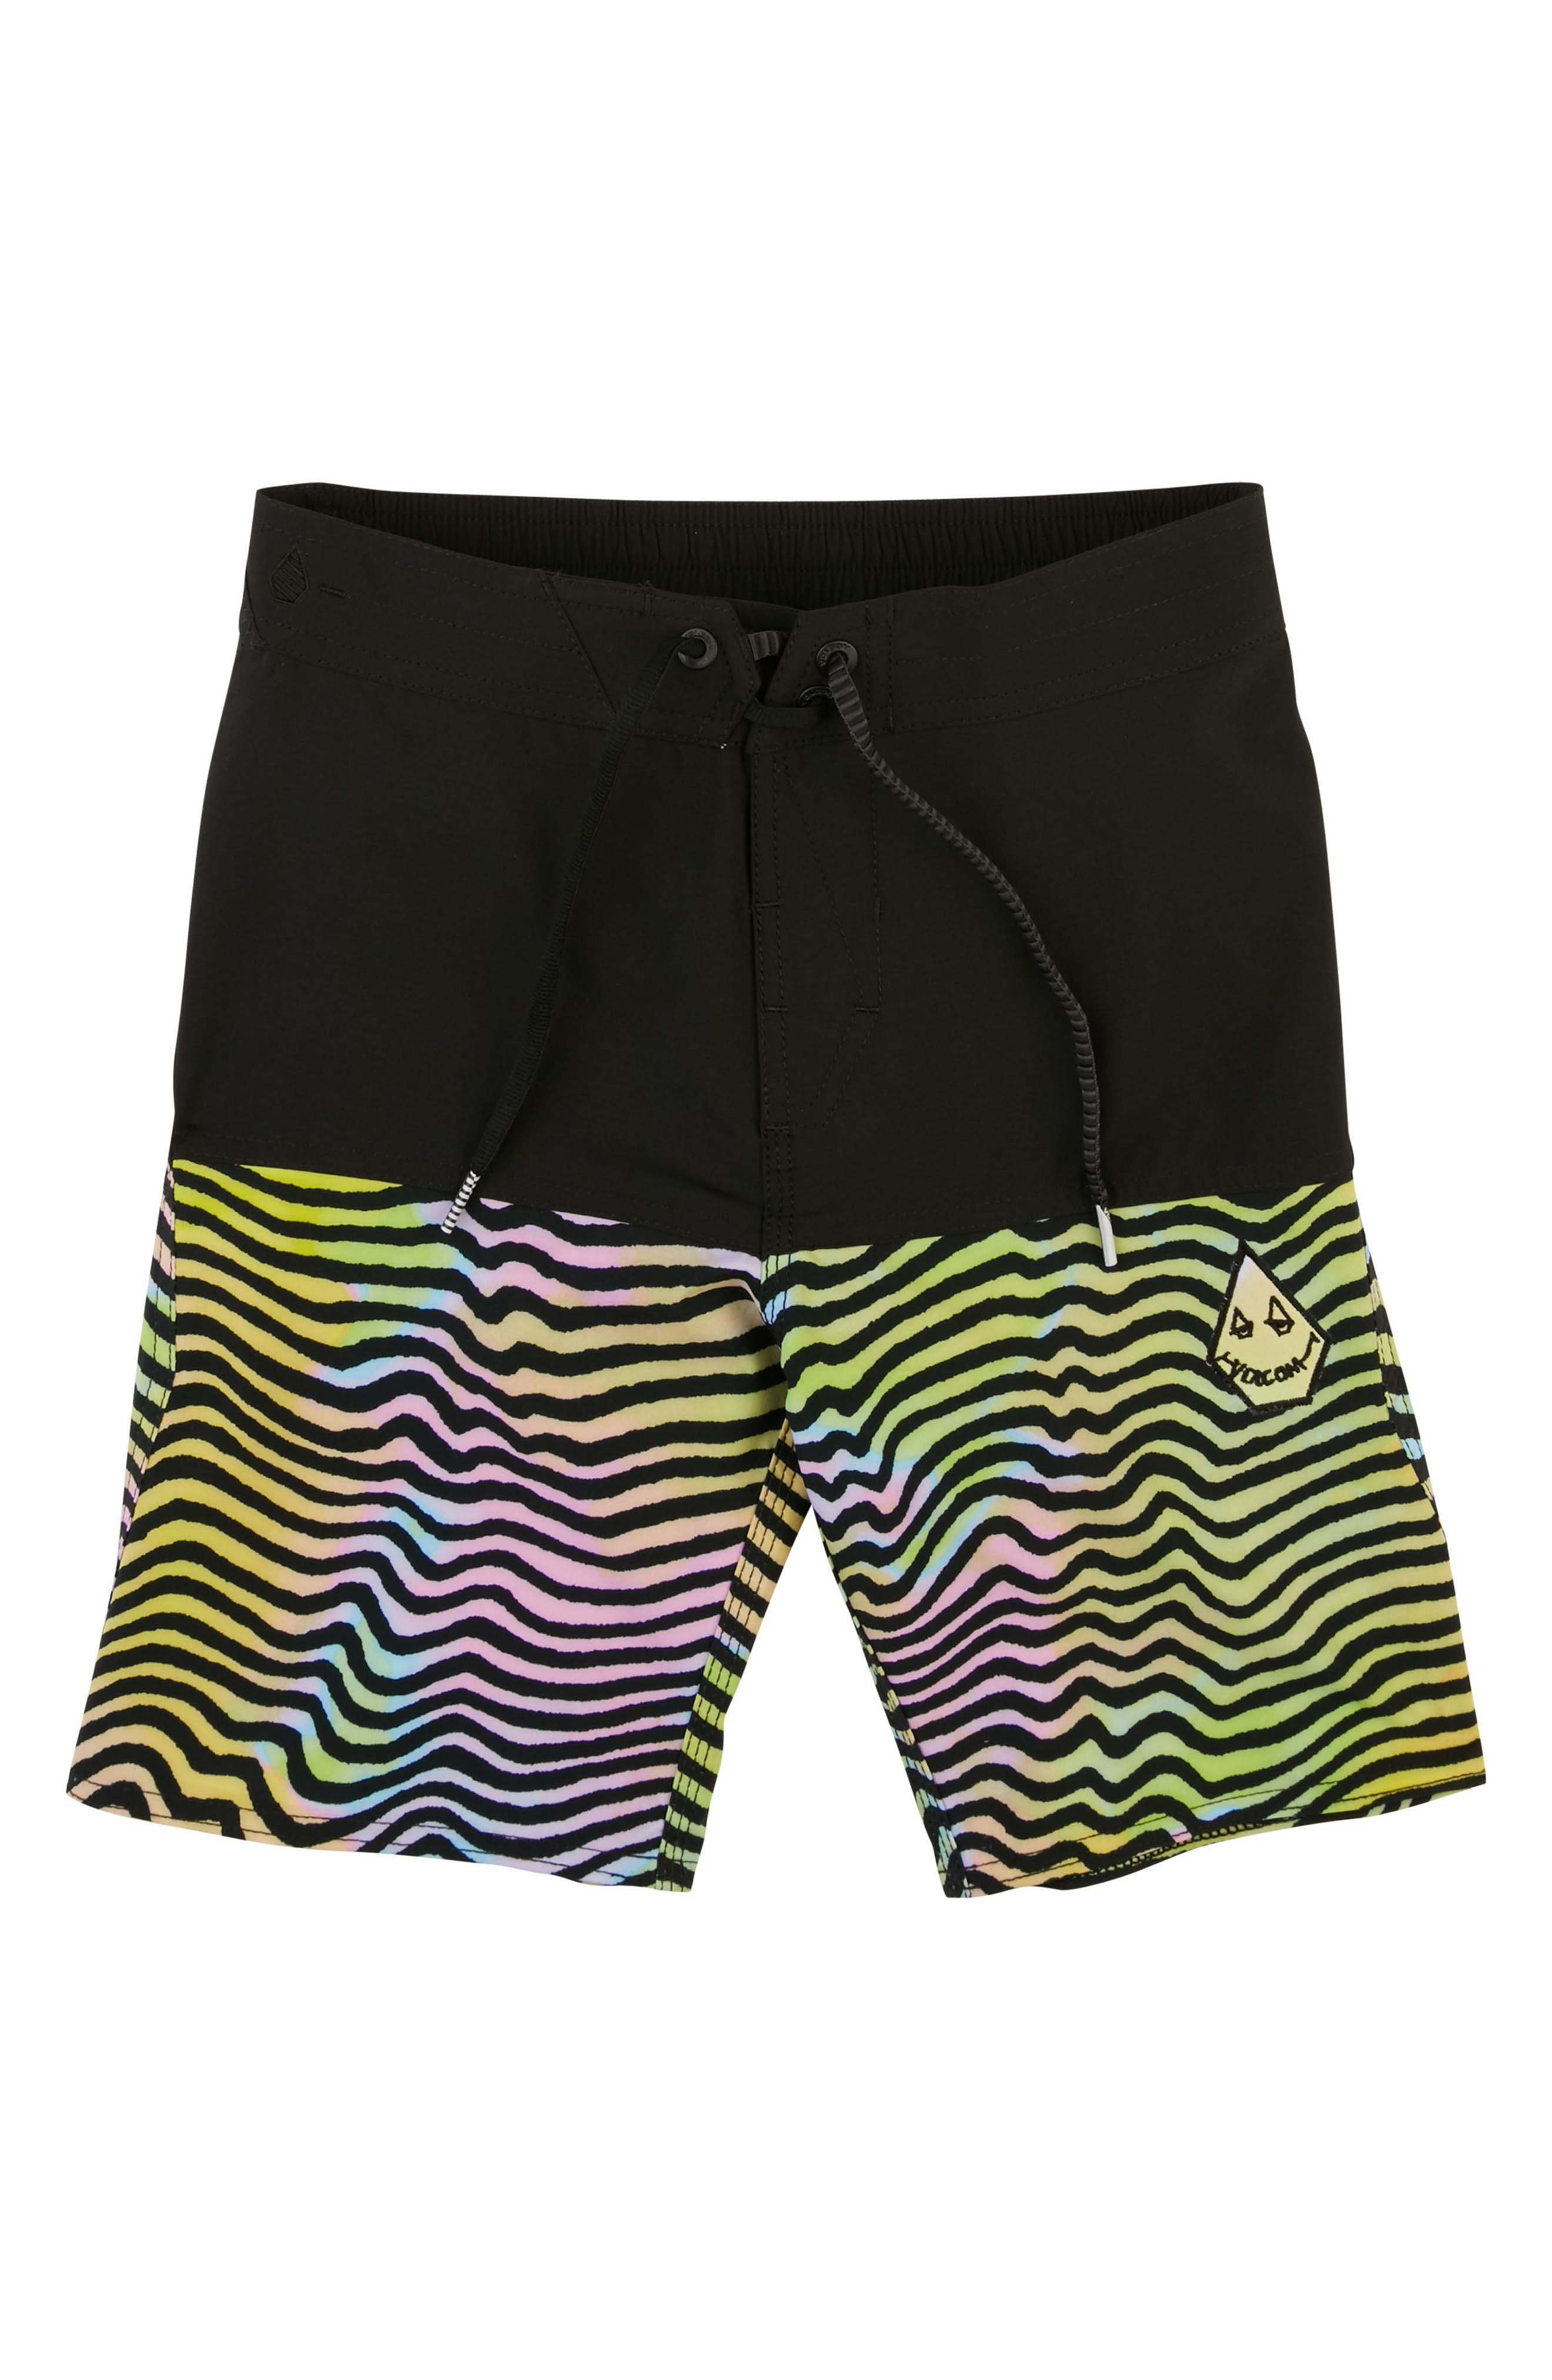 Vibes Board Shorts,                             Main thumbnail 1, color,                             Multi